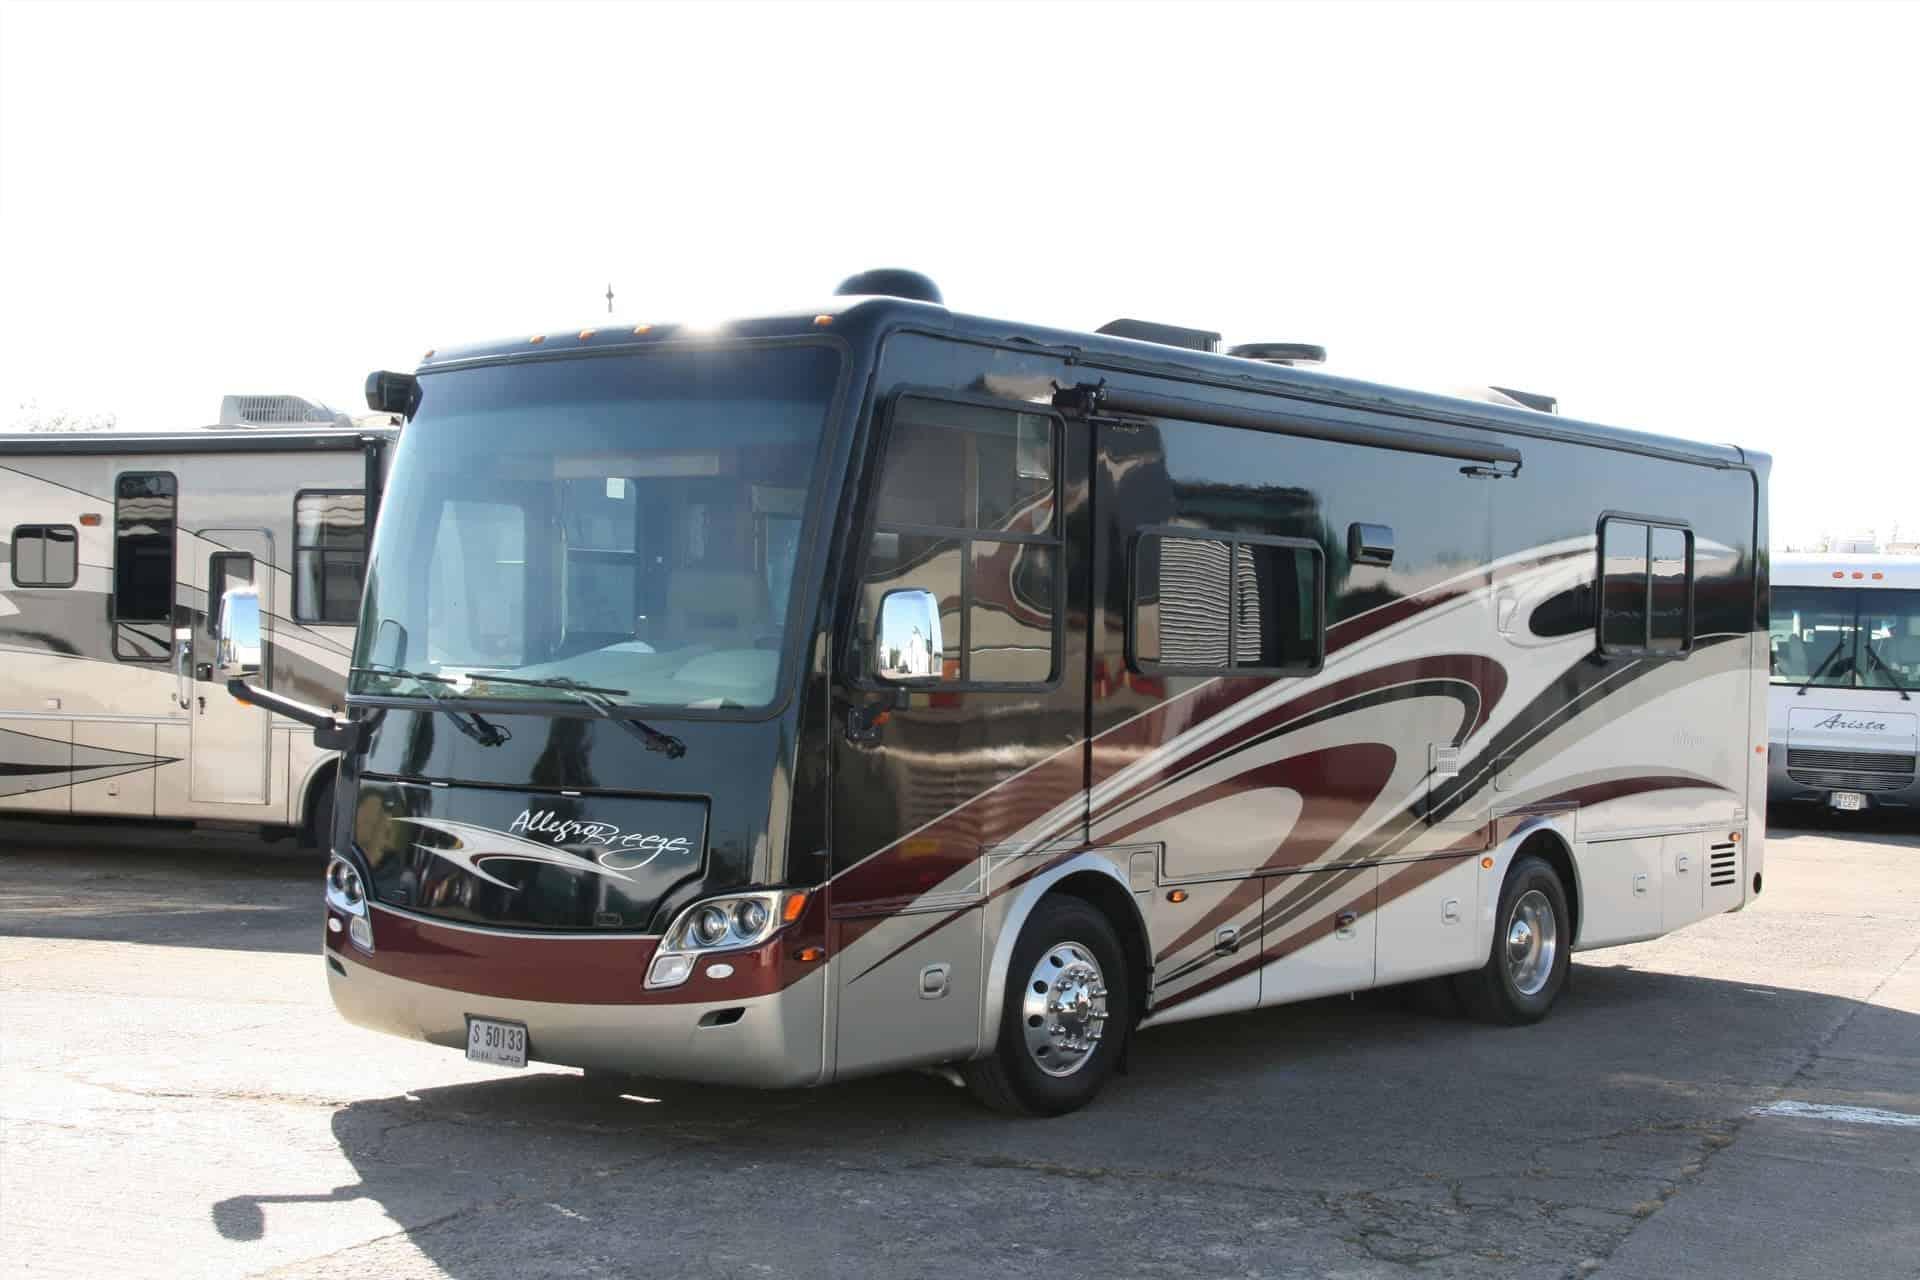 American RV Motorhome IVA Pass